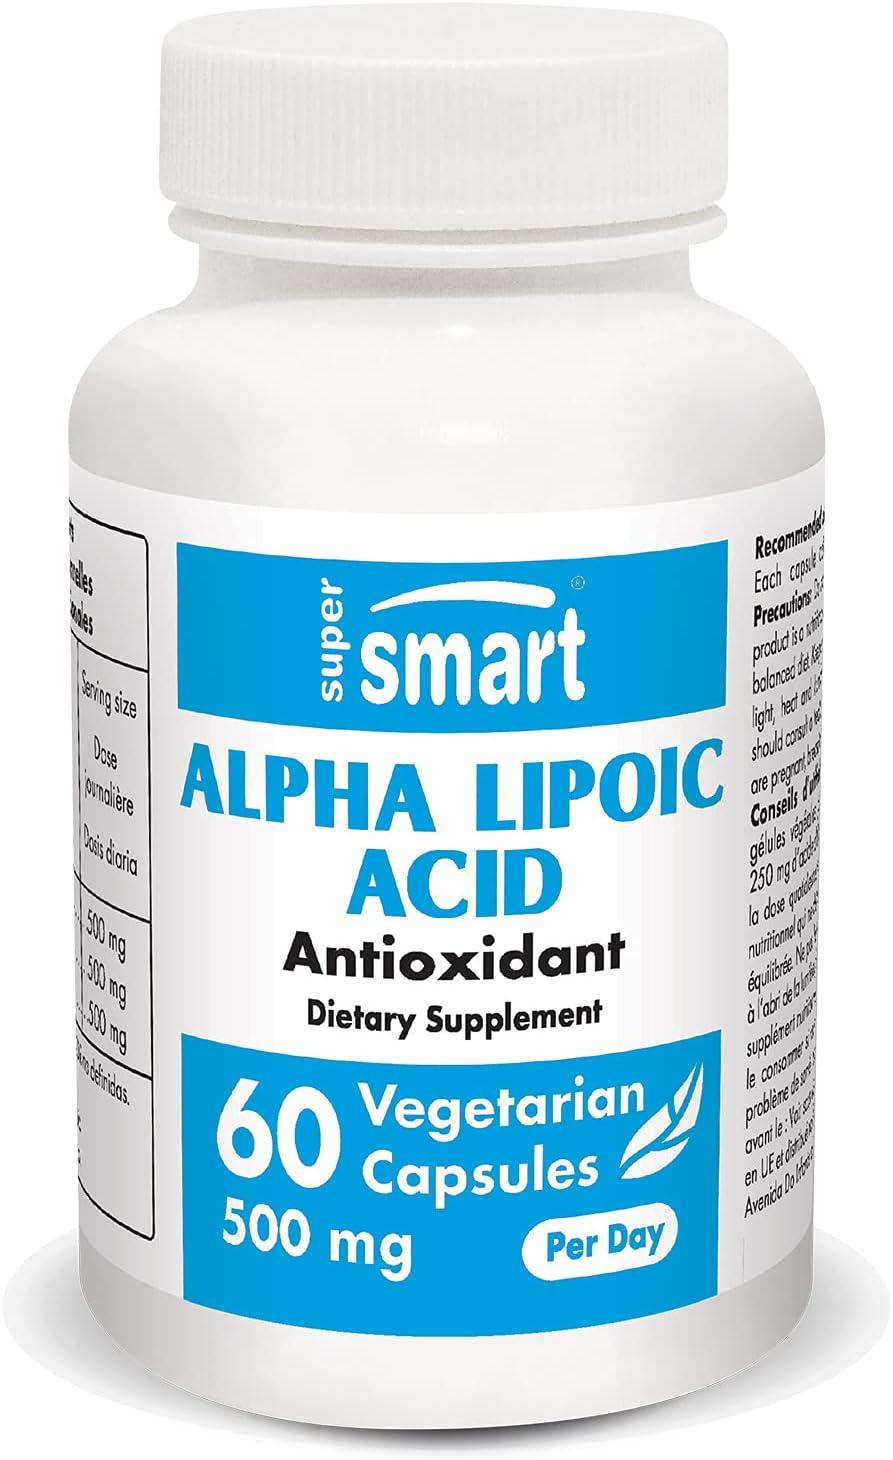 Supersmart - Alpha Lipoic Acid 500 Elegant Day mg Antiox Outlet ☆ Free Shipping Universal Per